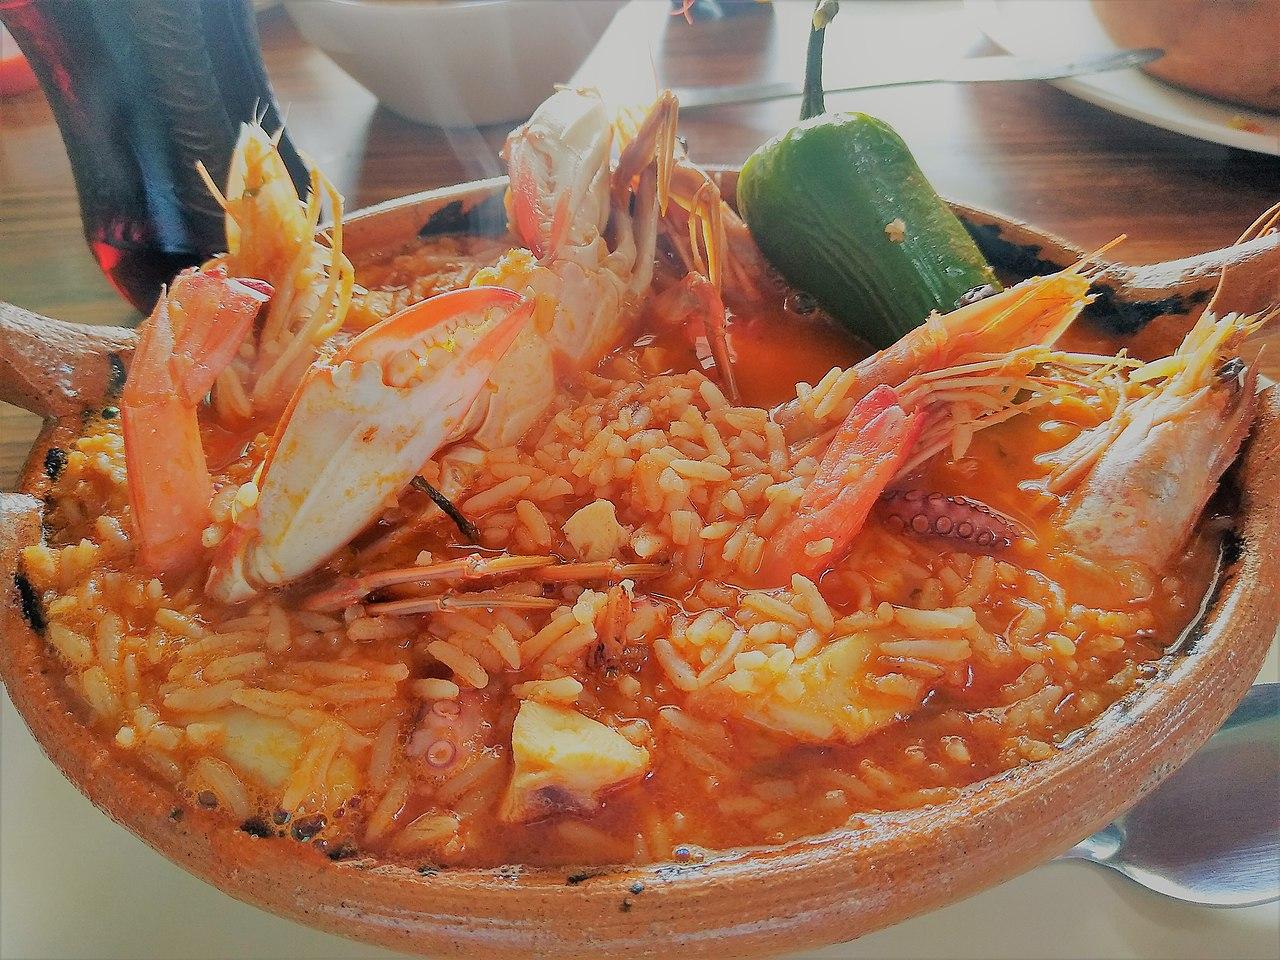 Plato de arroz a la tumbada